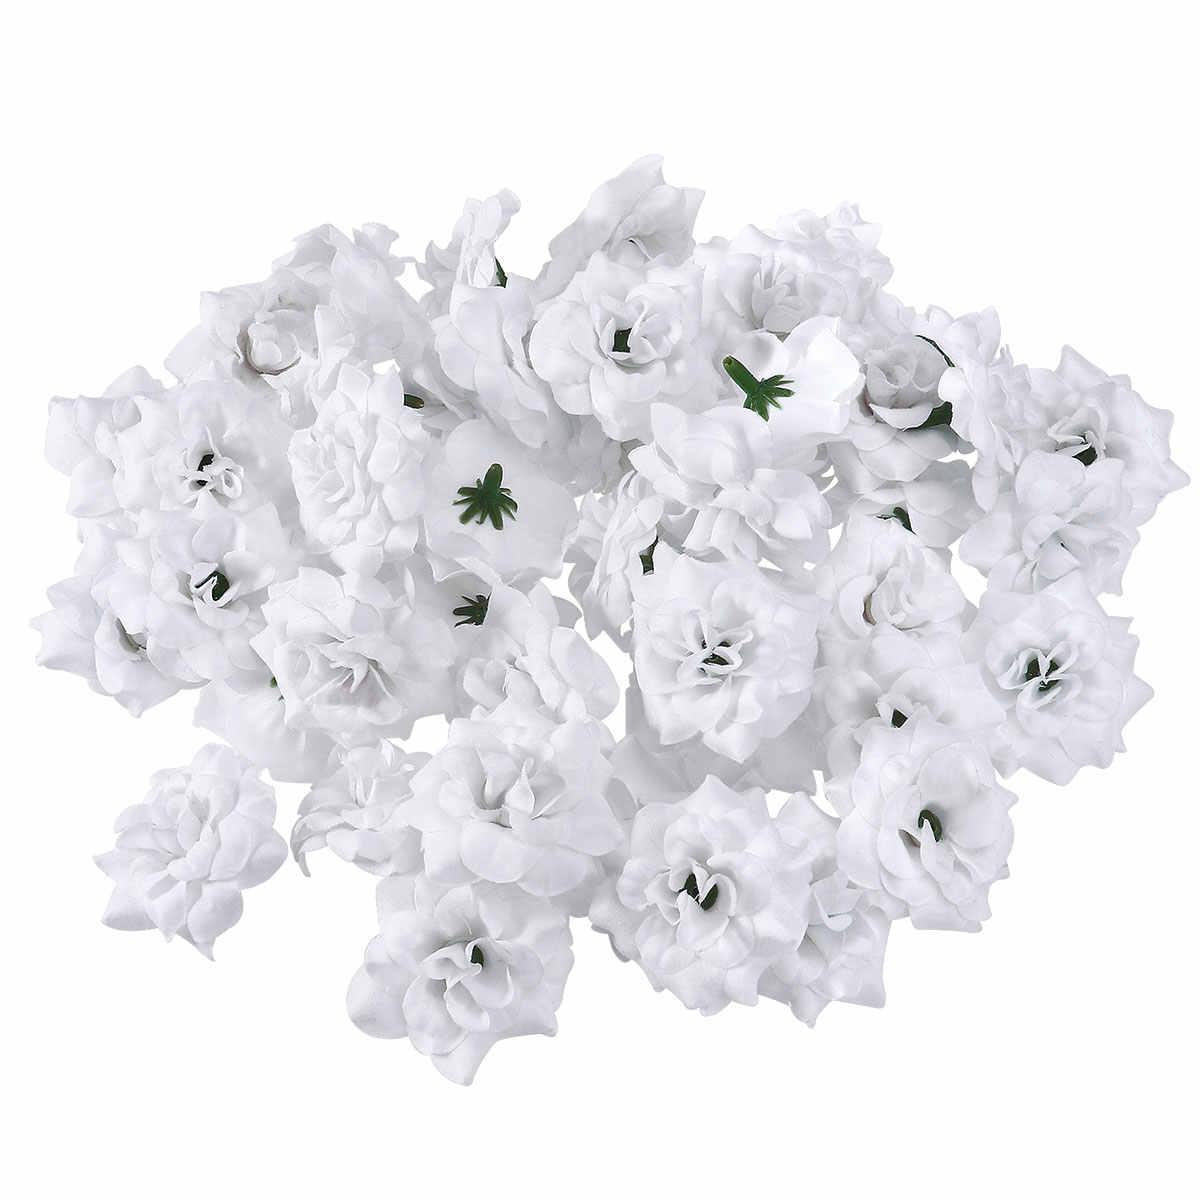 50PCS Mini 4.5 ซม.โฟม Silk Rose ดอกไม้ประดิษฐ์ดอกไม้สีขาว Beige Rose ดอกไม้งานแต่งงานตกแต่ง Scrapbooking Rose ดอกไม้